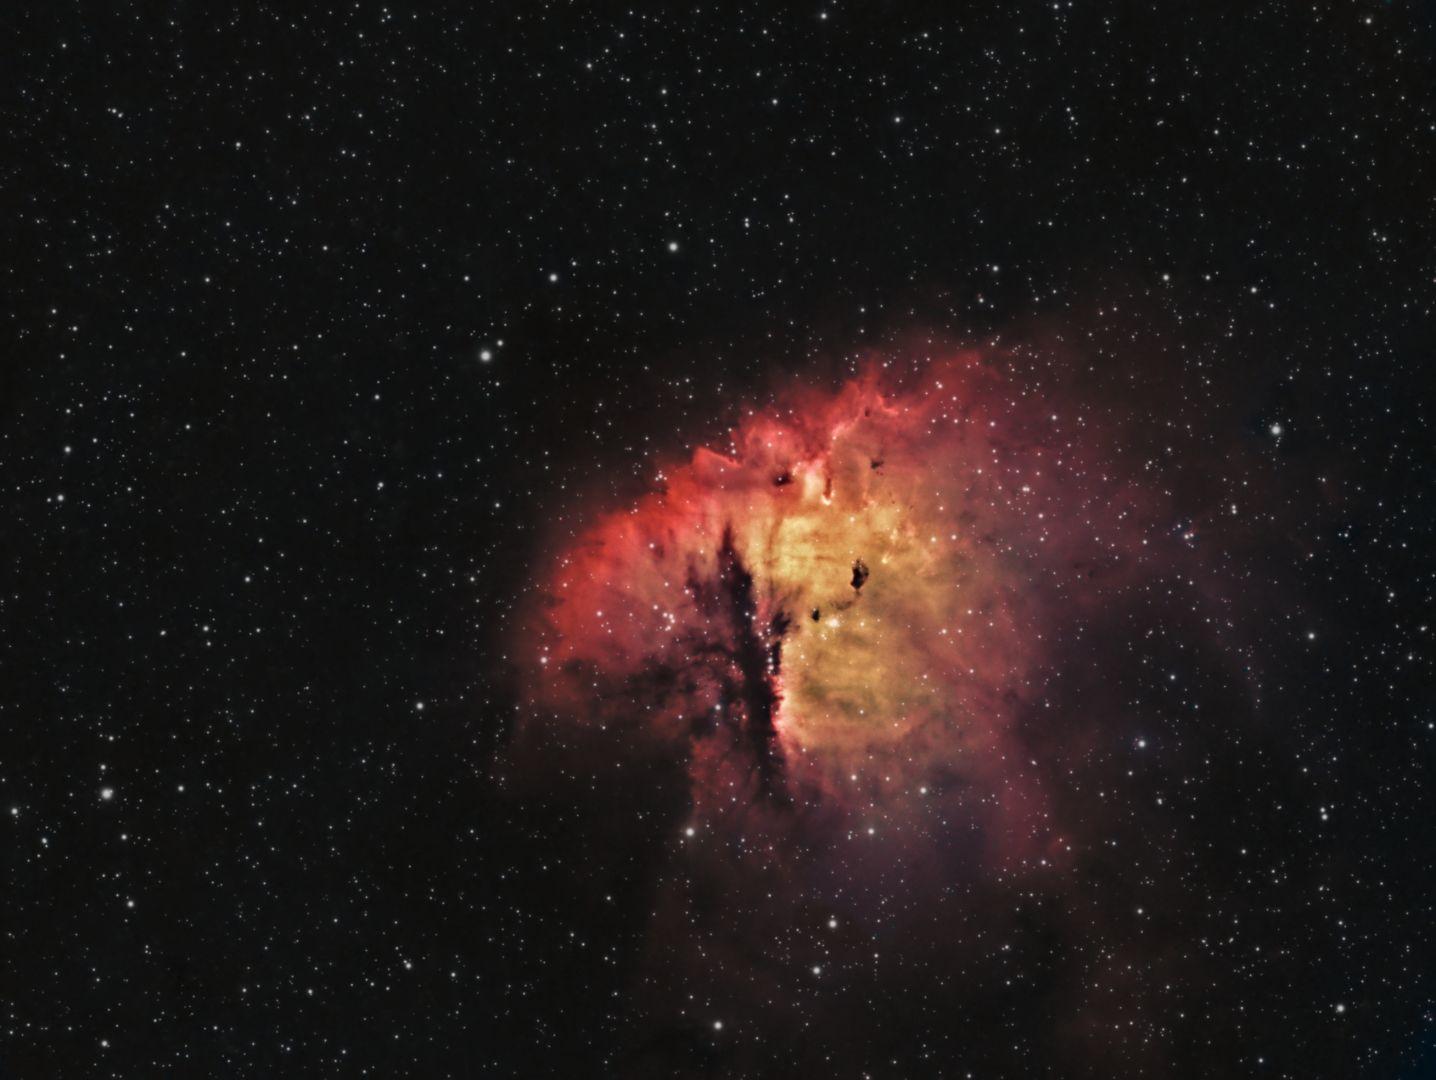 NGC281_Pacman_ready.jpg